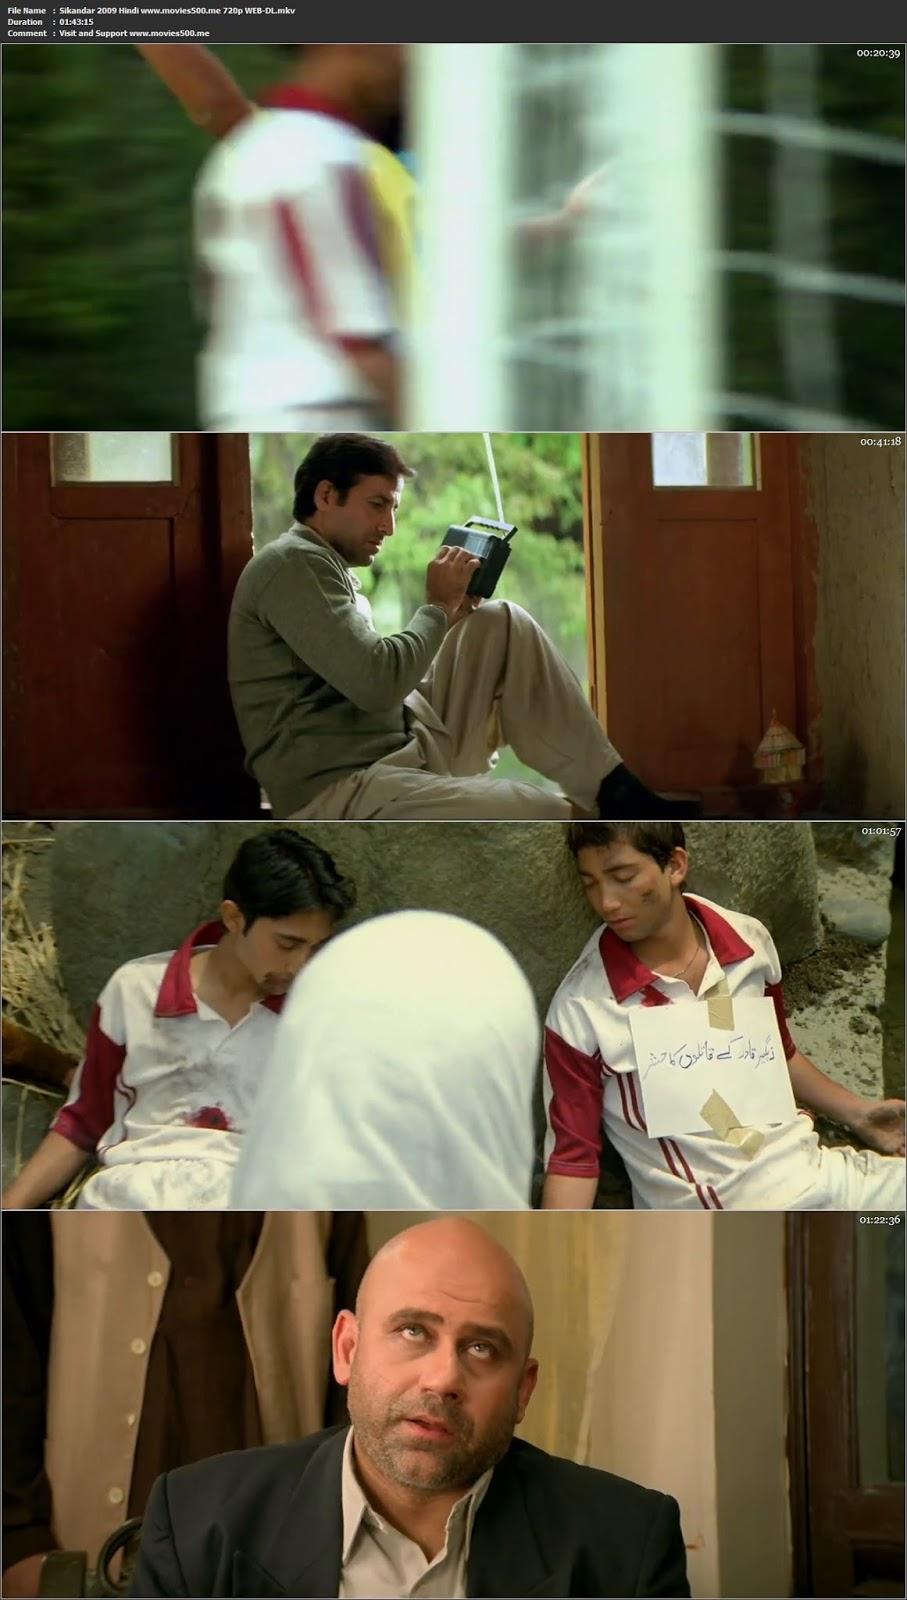 Sikandar 2009 Hindi Full Movie 700MB WEB DL 720p at softwaresonly.com